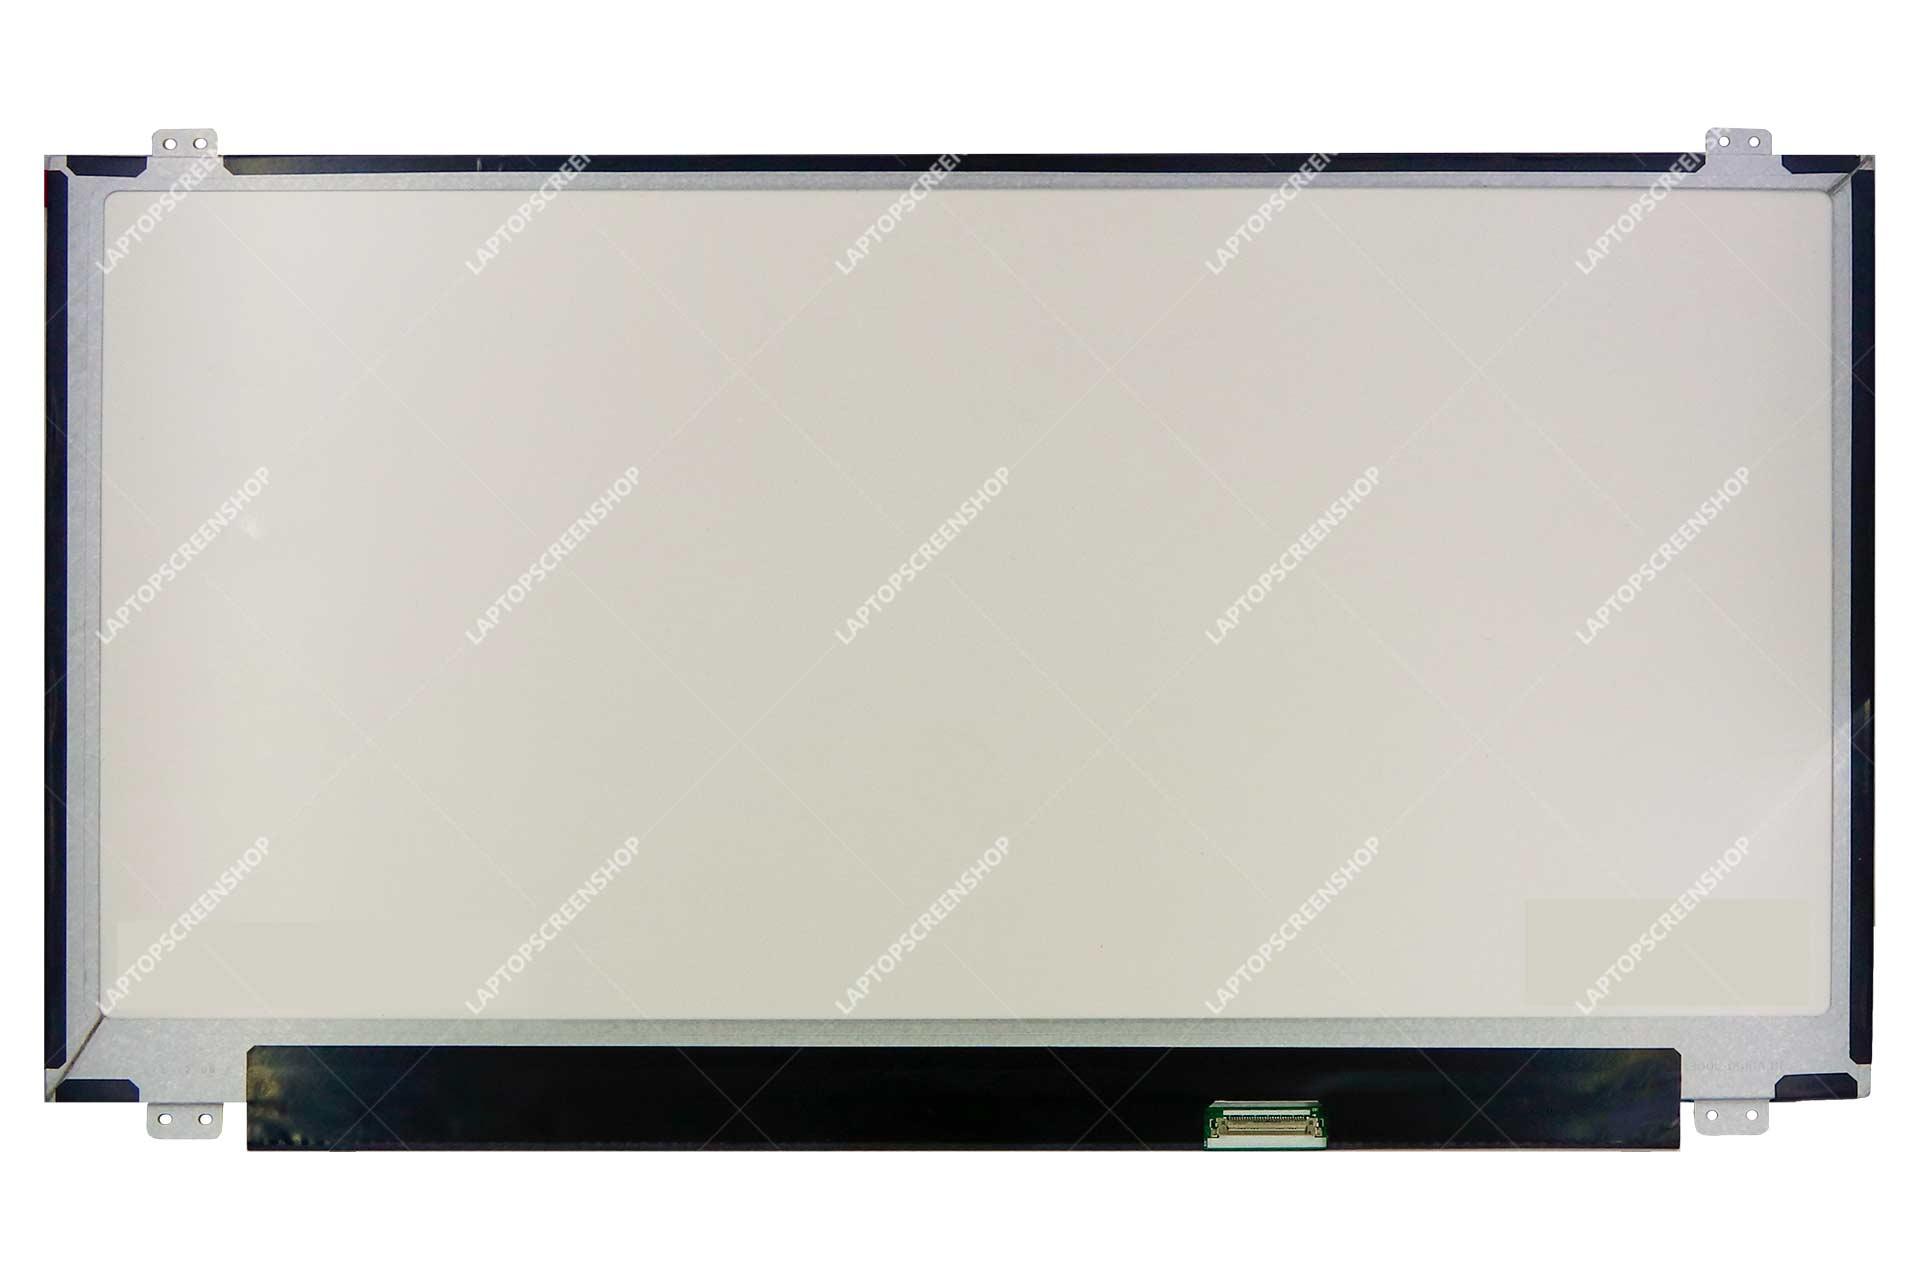 ACER-ASPIRE-E1-510-2495-LCD |HD|فروشگاه لپ تاپ اسکرين | تعمير لپ تاپ